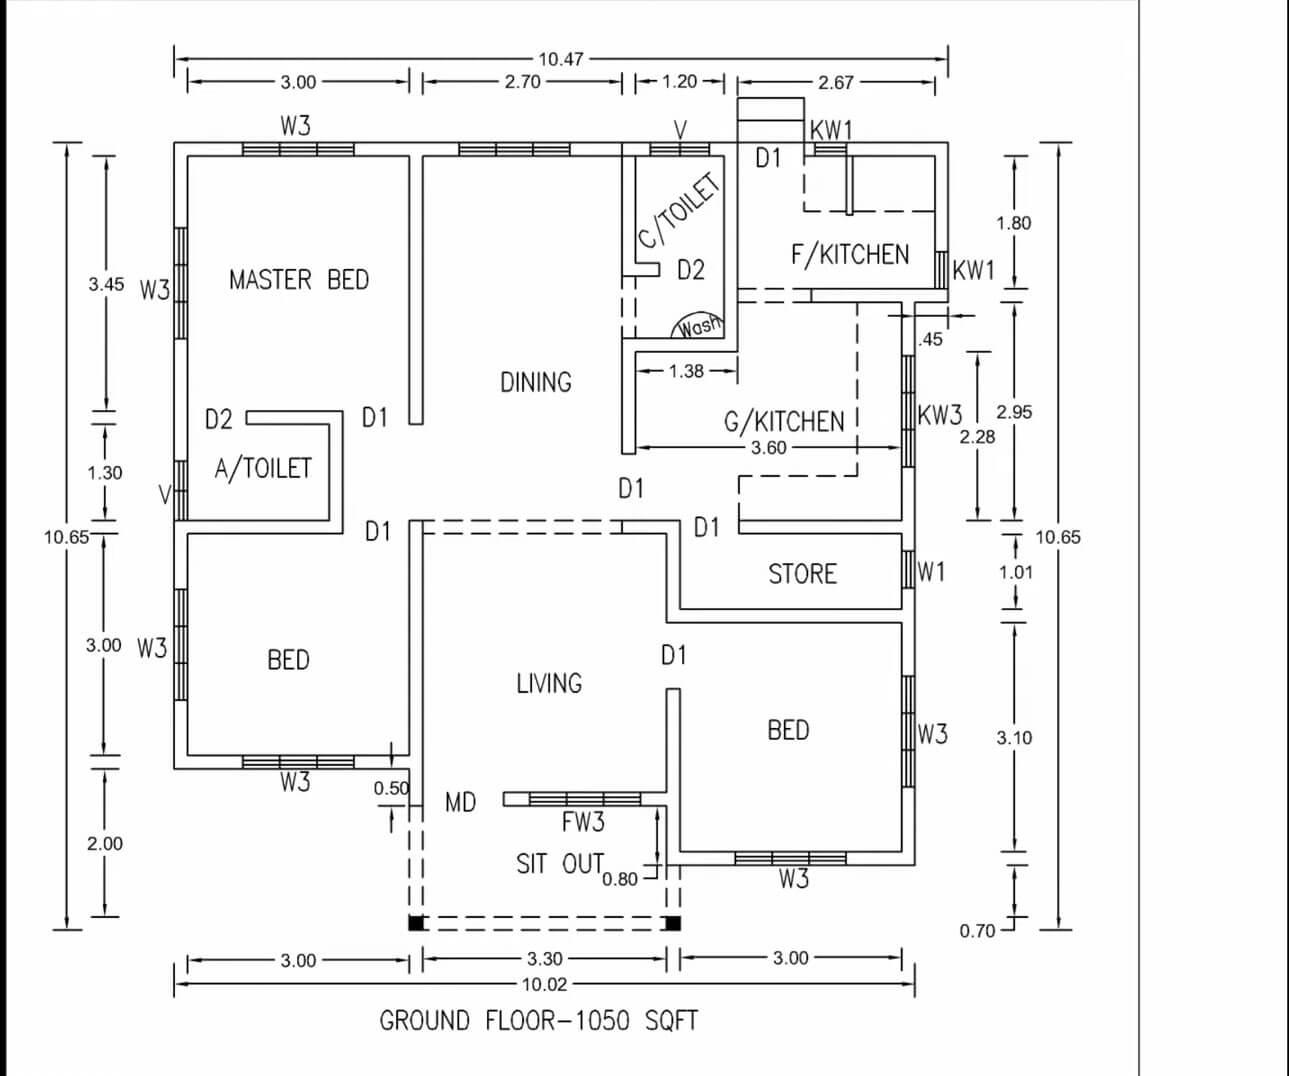 1000-sq-ft-House-Plans-3-Bedroom-sketch